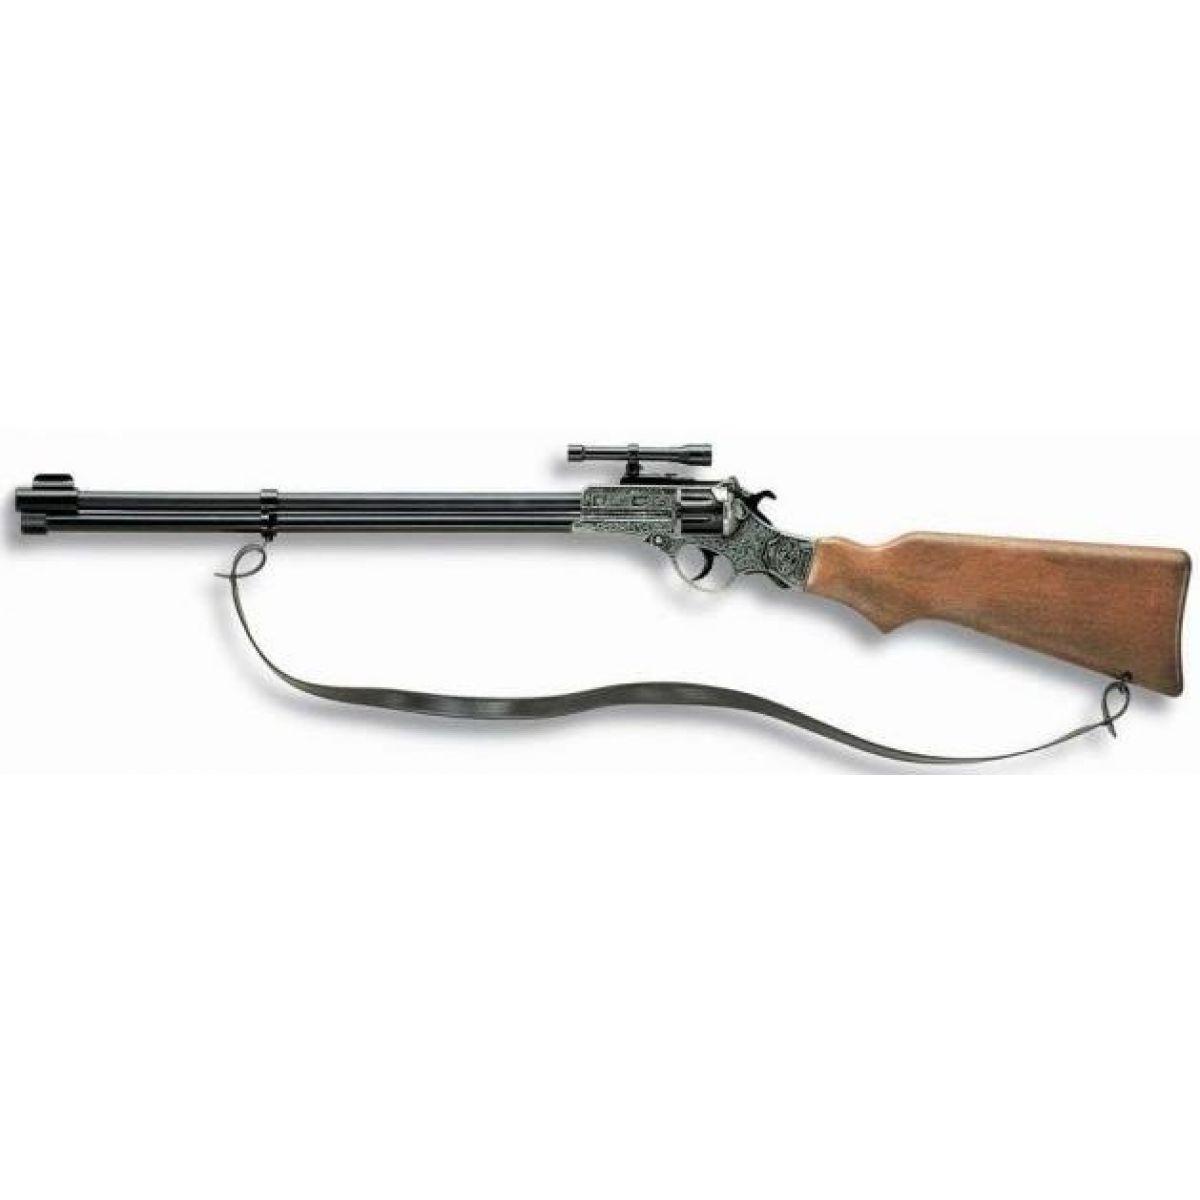 Edison Westernová puška Enfield Antik osmiranná